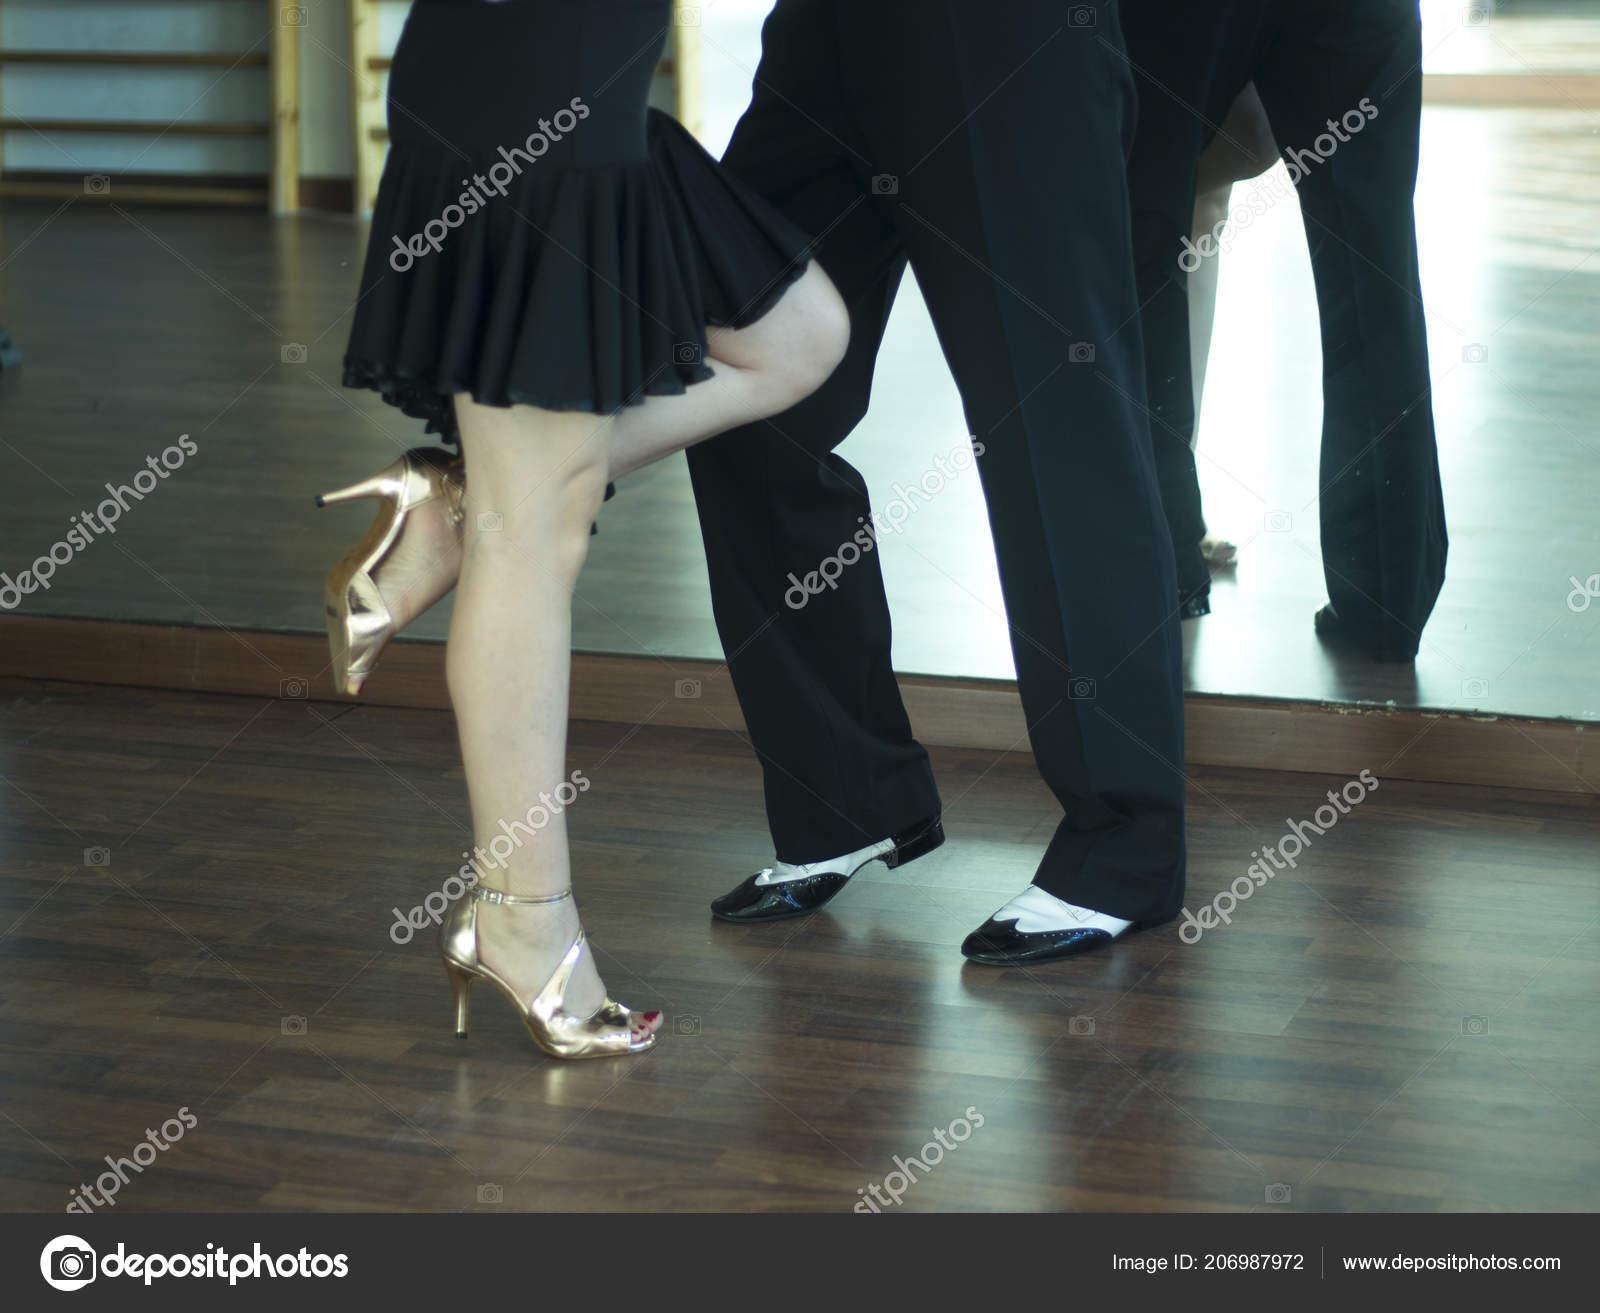 Baile Salón Salsa Dancer Instructores Hombre Mujer Pareja